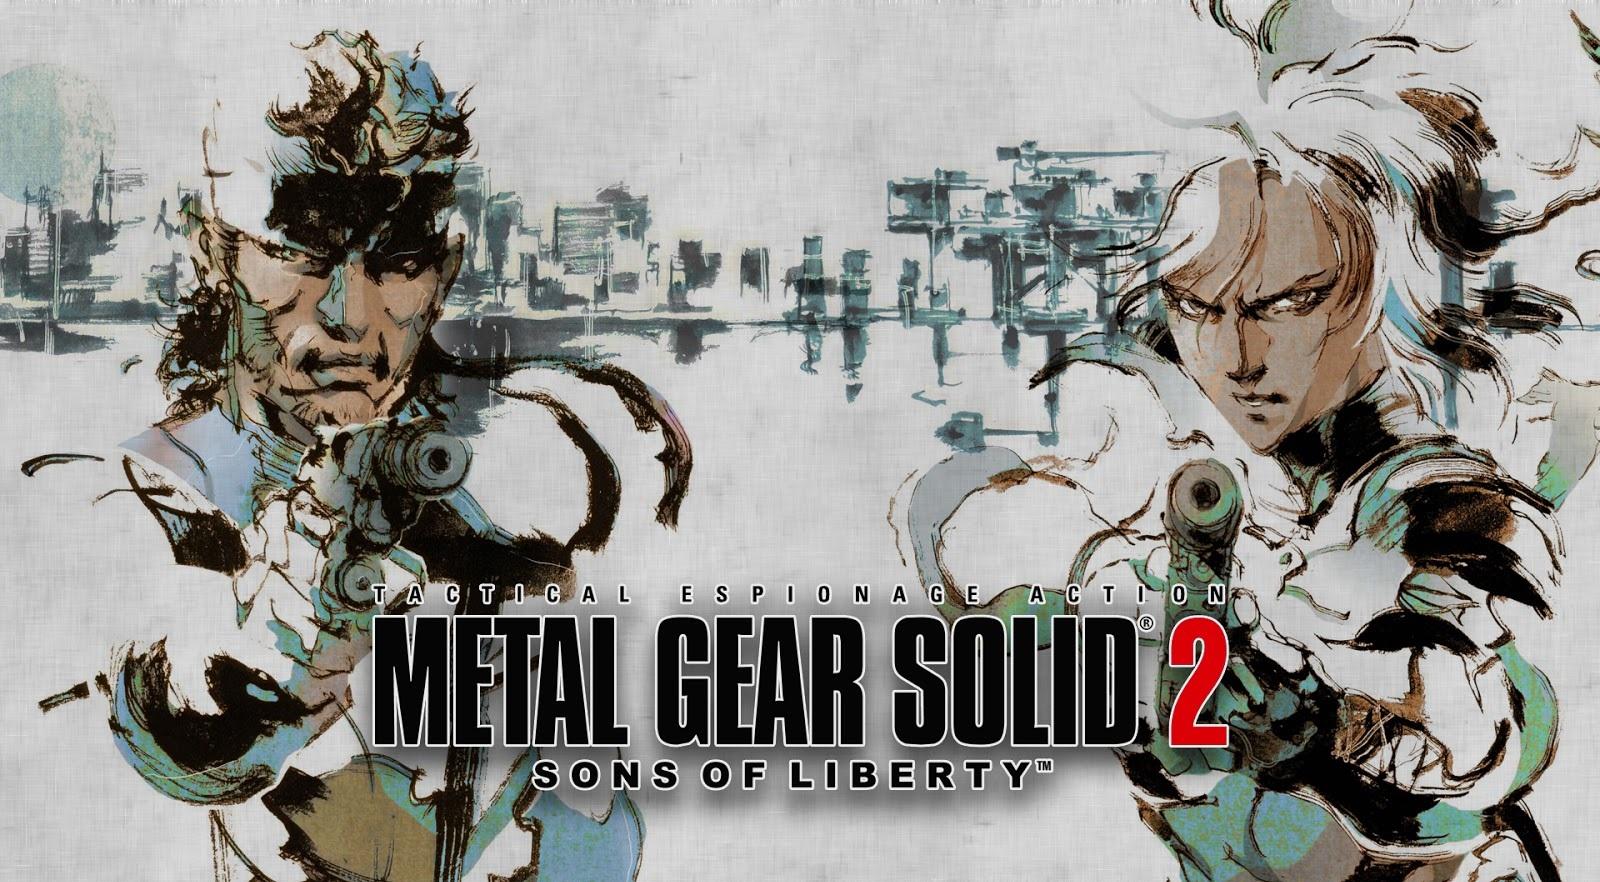 Filosofia - Metal Gear Solid 2